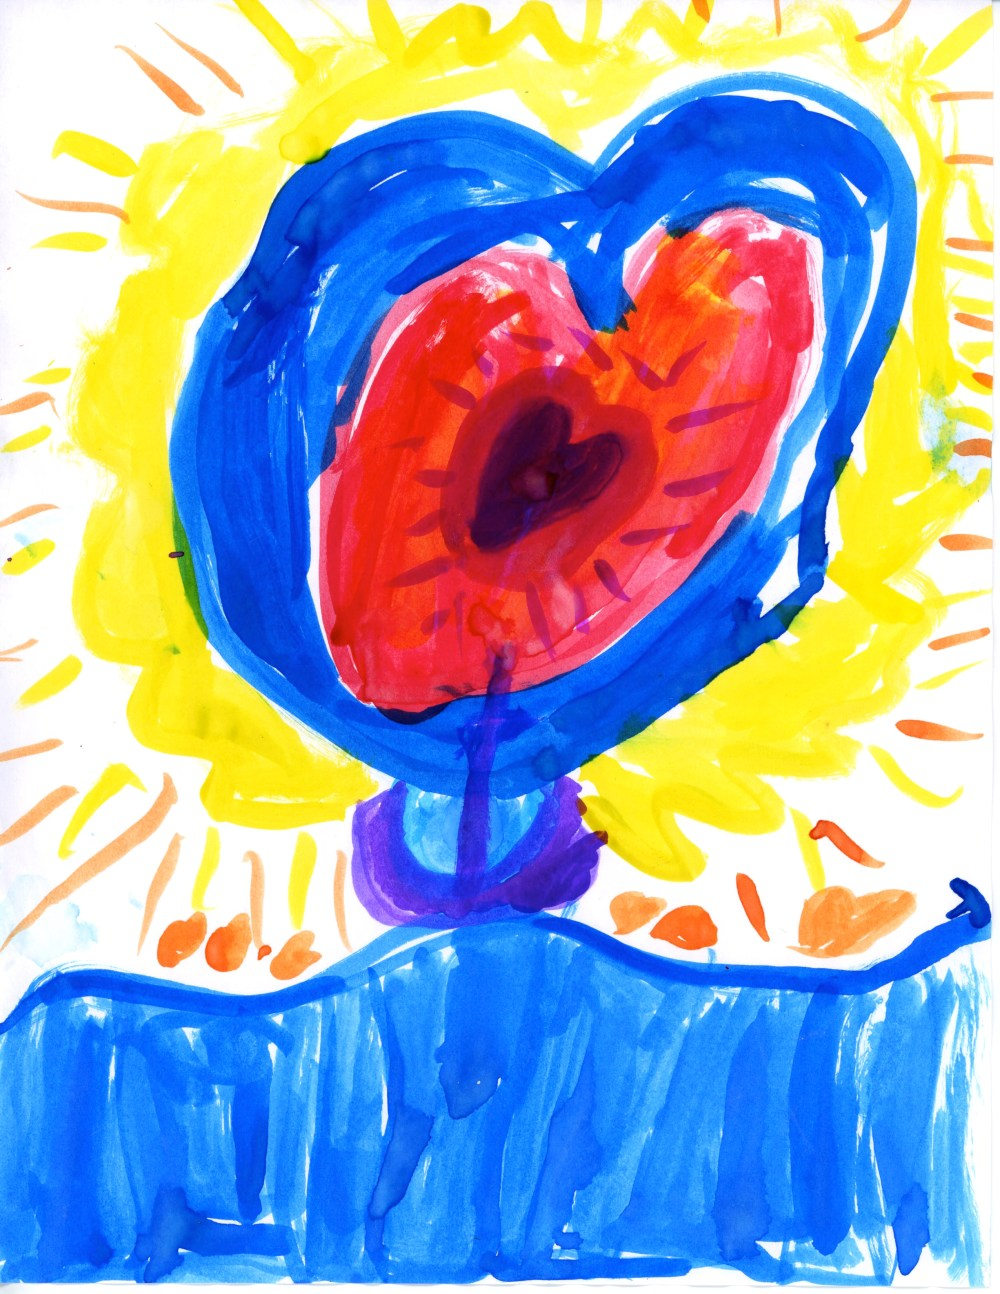 heart, yearning, open heart, children's drawing, mackenzie chester, the sacred everyday